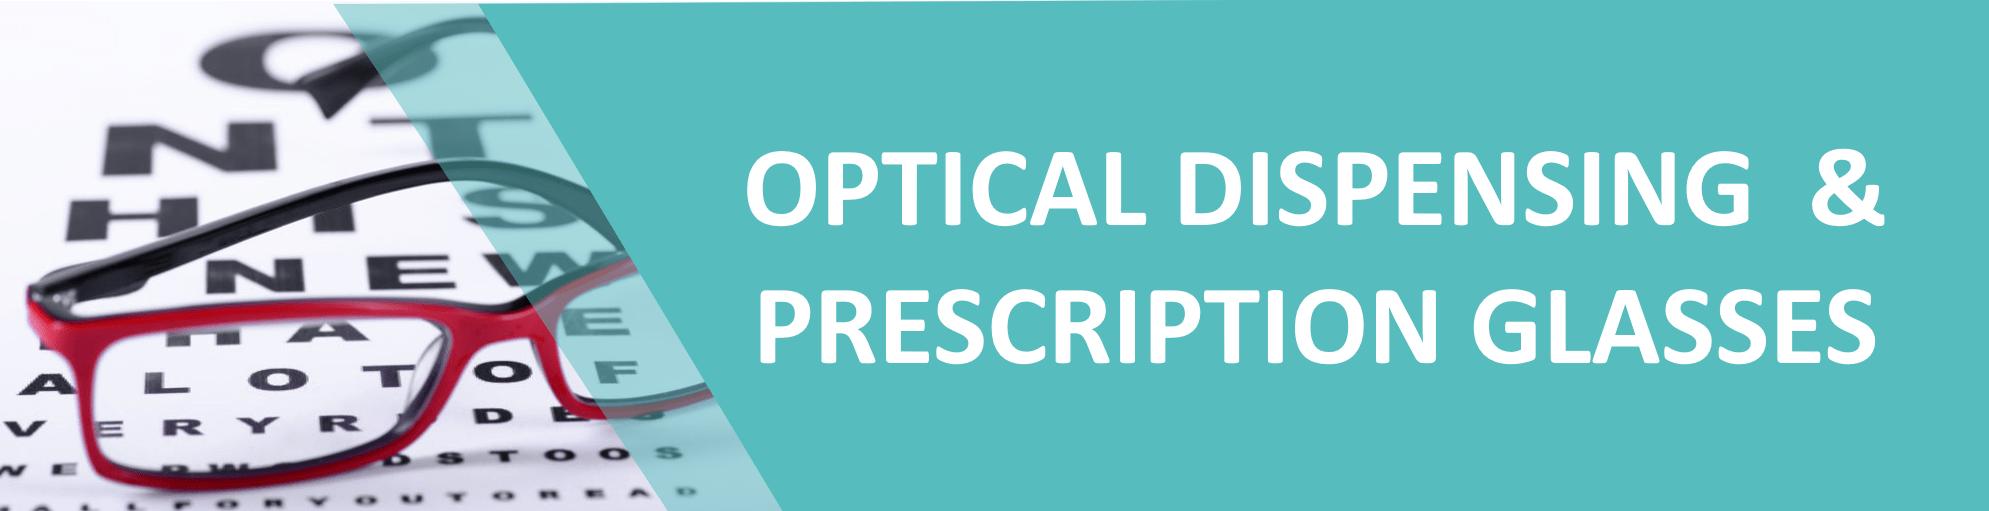 Prescription Glasses - Spectacles - Optical Dispensing - Norwest